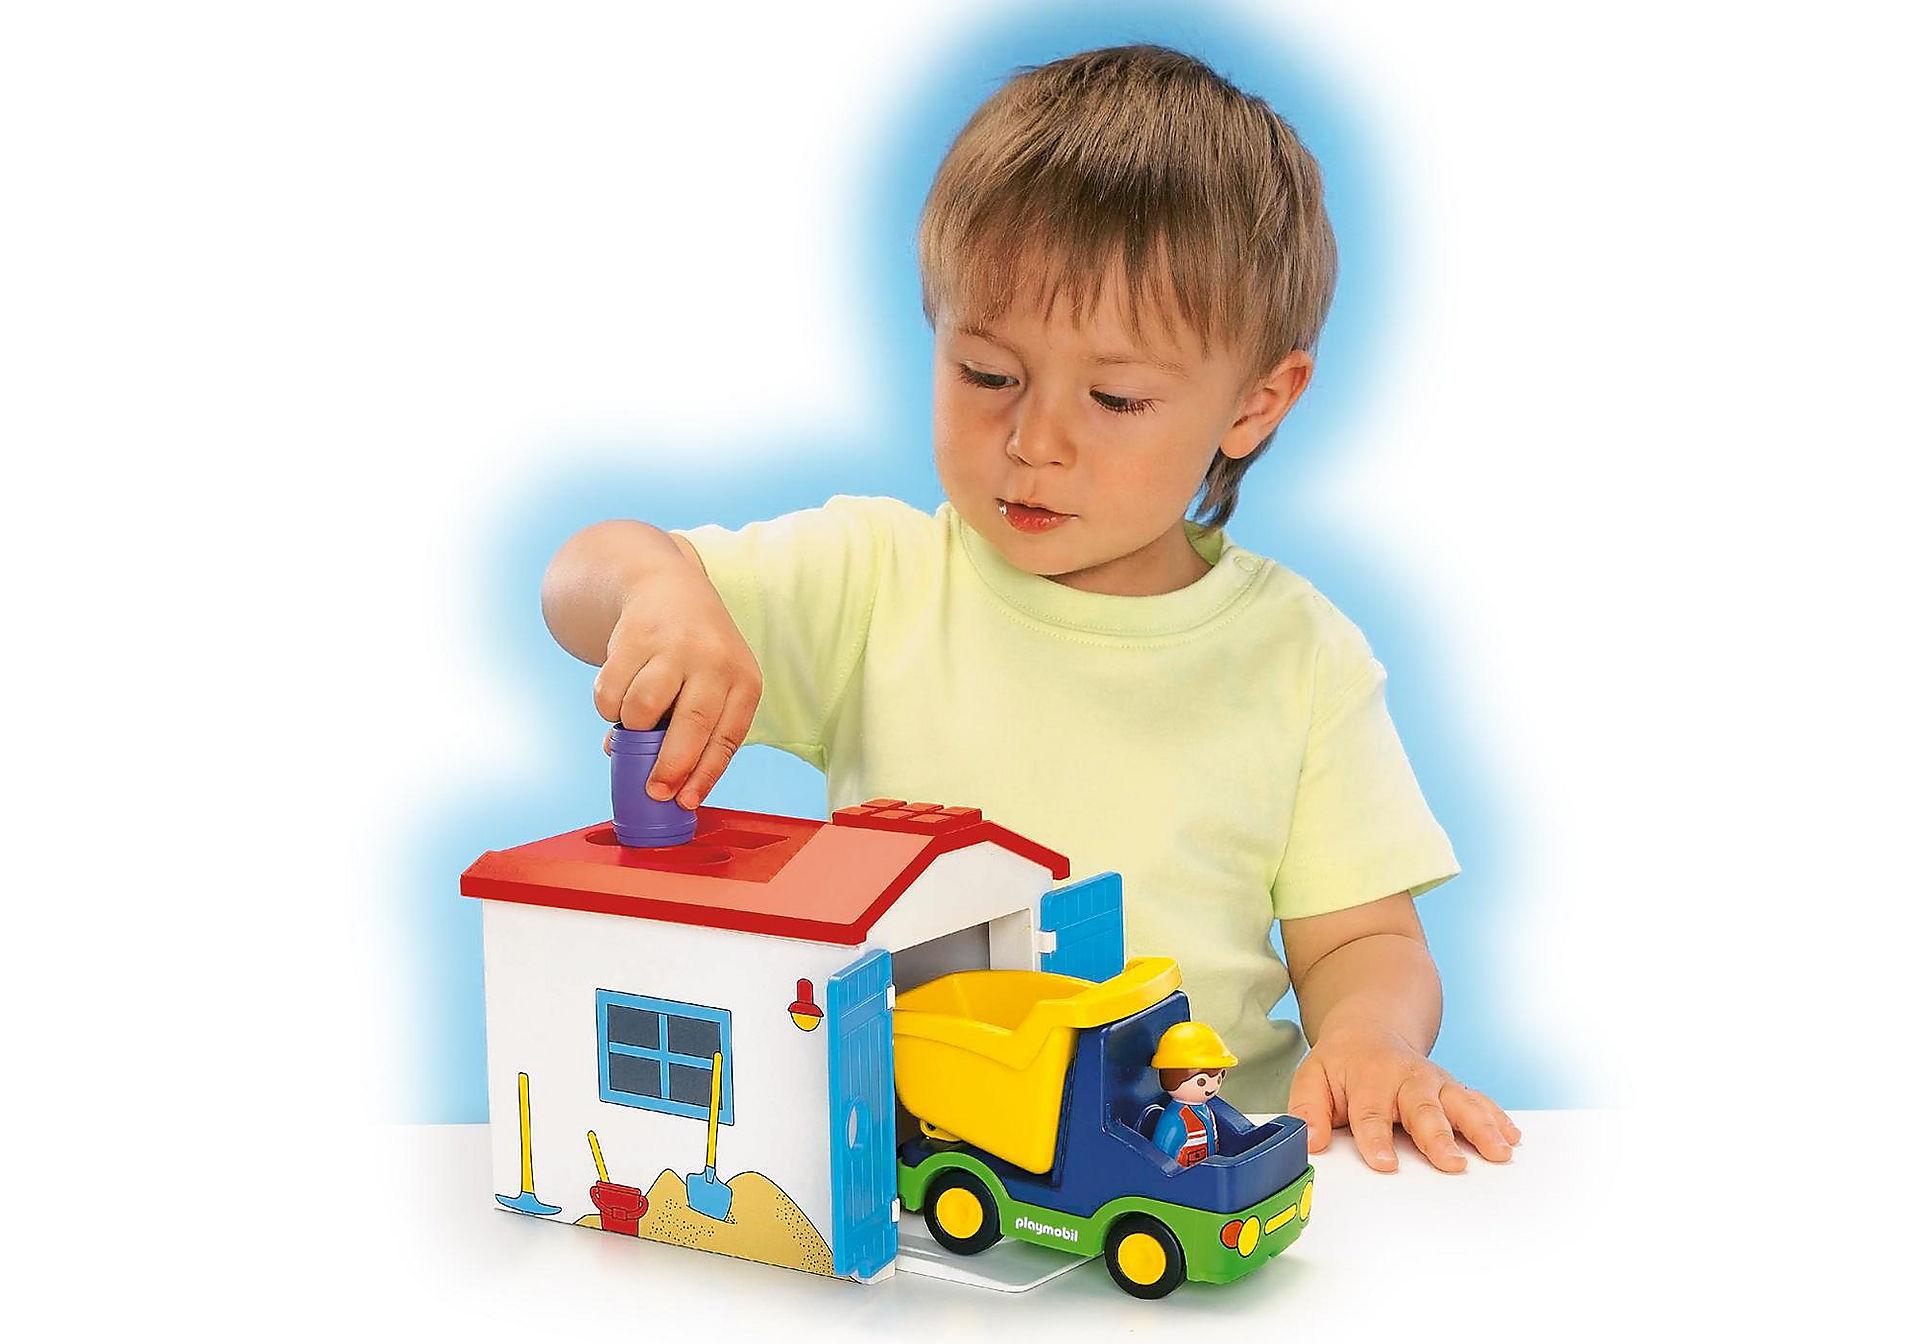 http://media.playmobil.com/i/playmobil/6759_product_extra2/1.2.3 Camión con Garaje